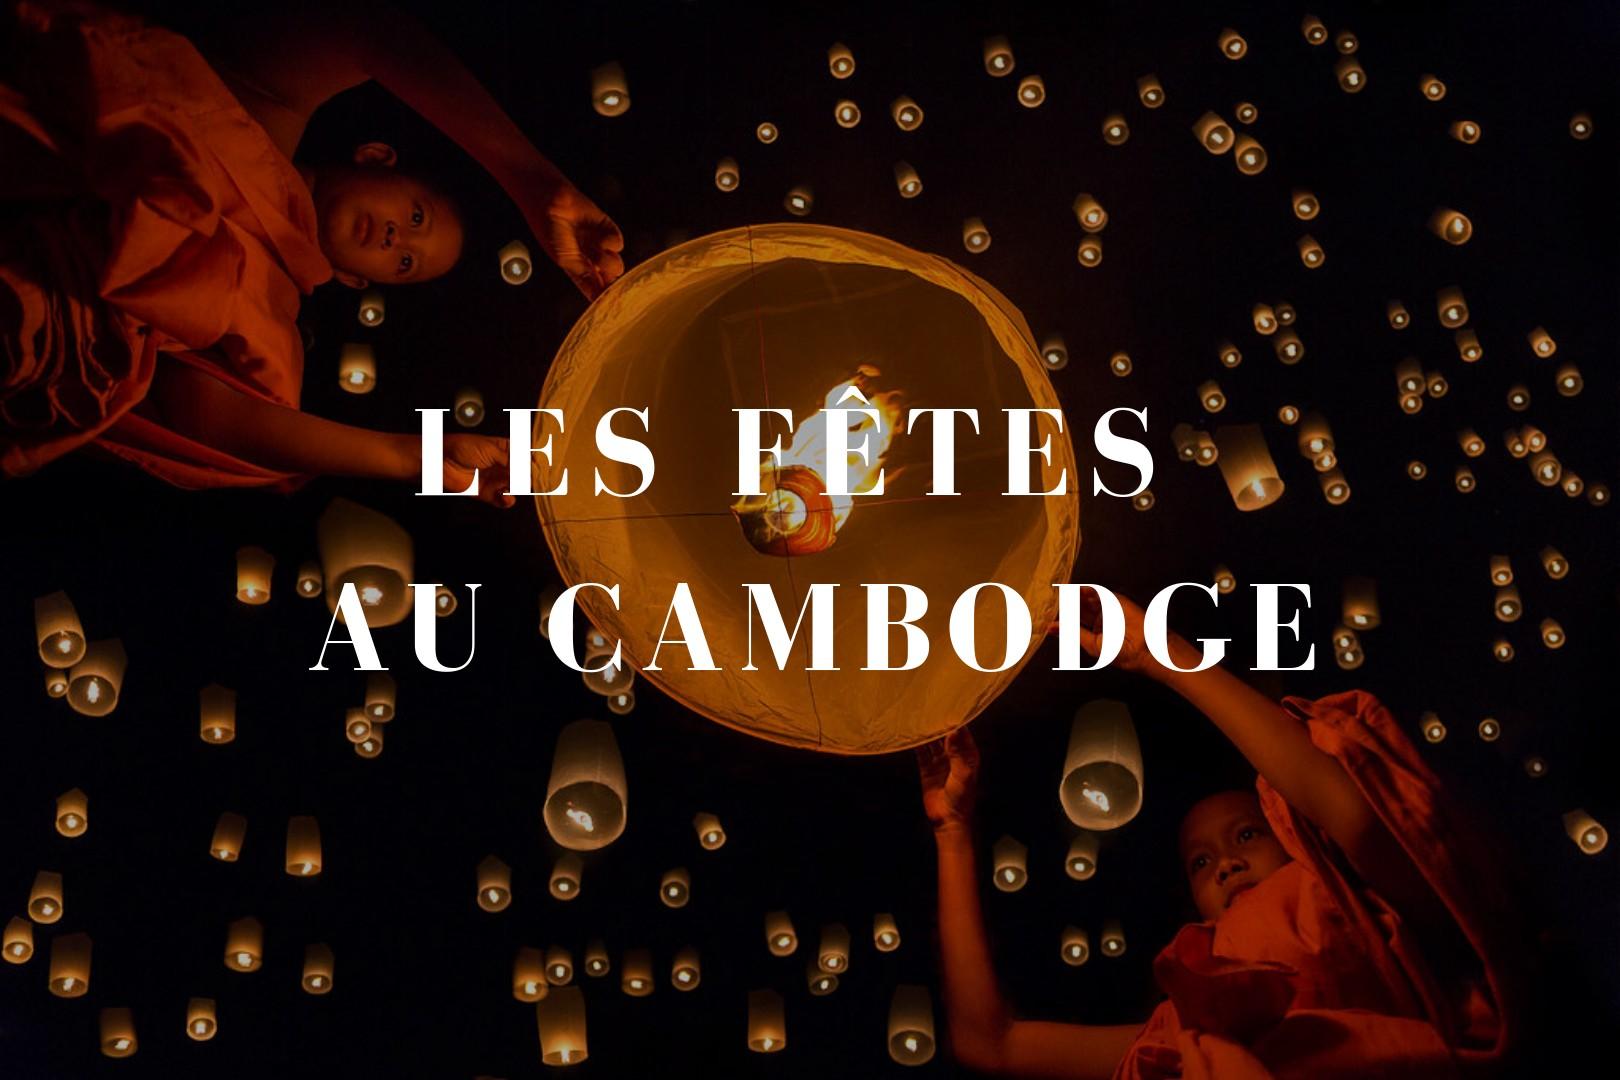 Les fêtes au Cambodge